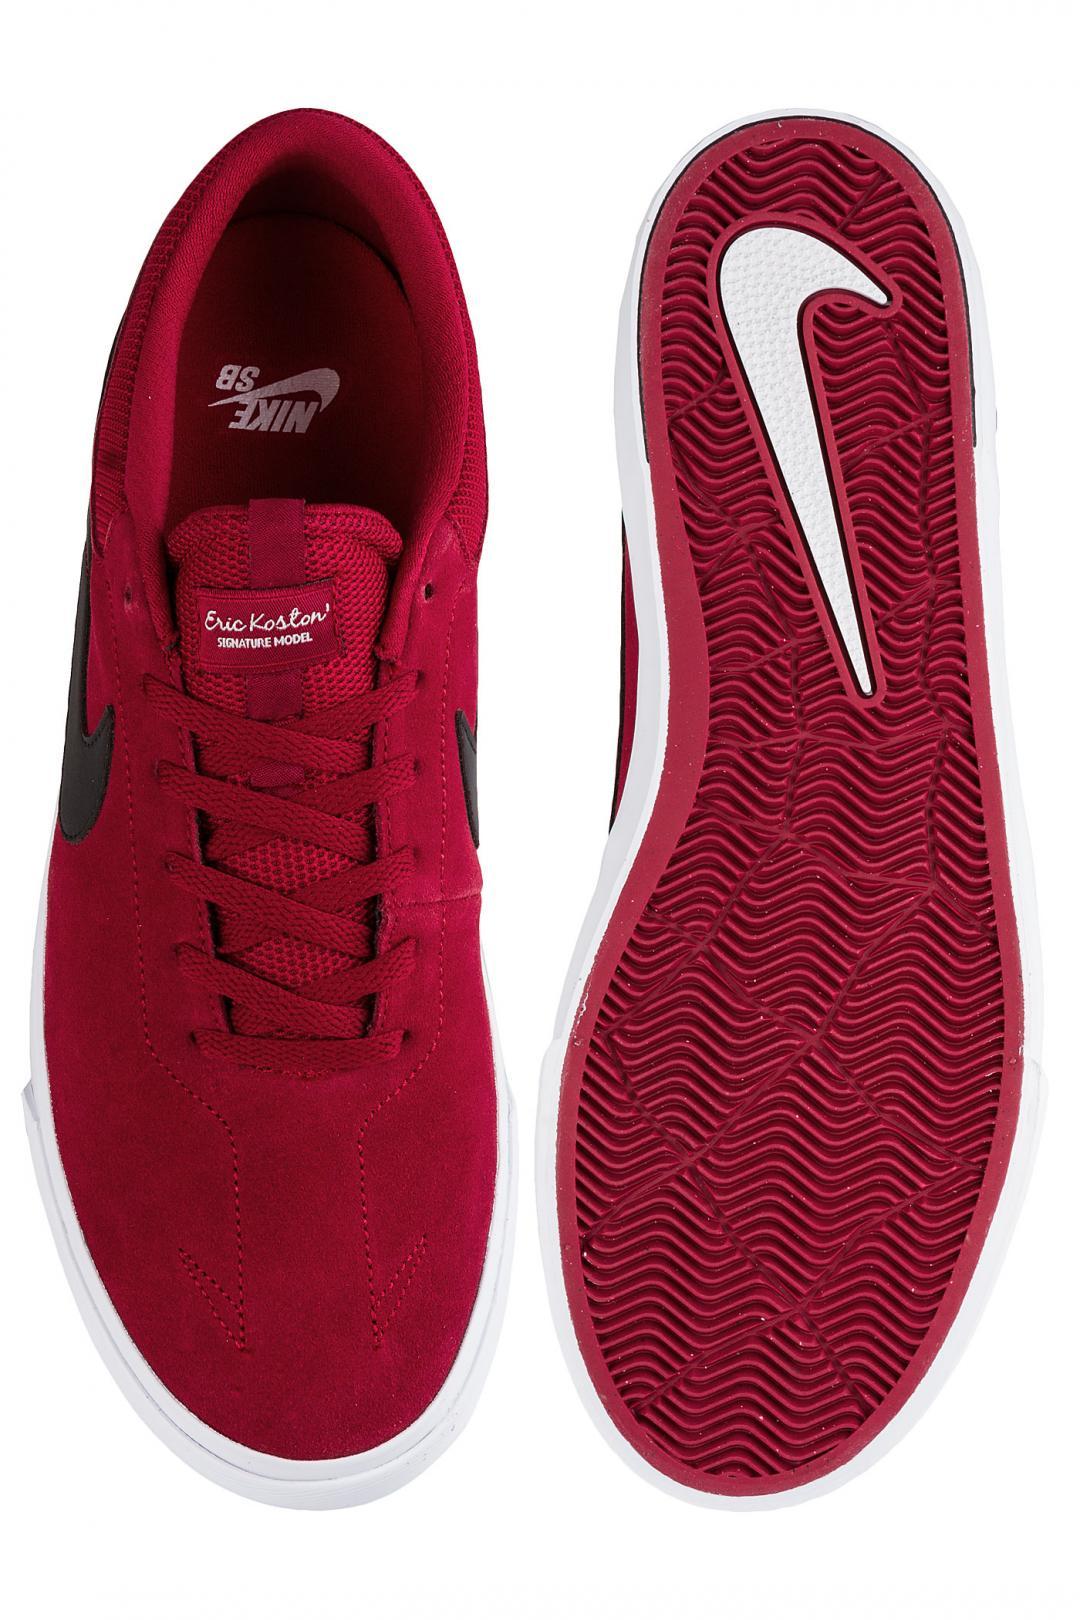 Uomo Nike SB Koston Hypervulc red crush black   Sneakers low top